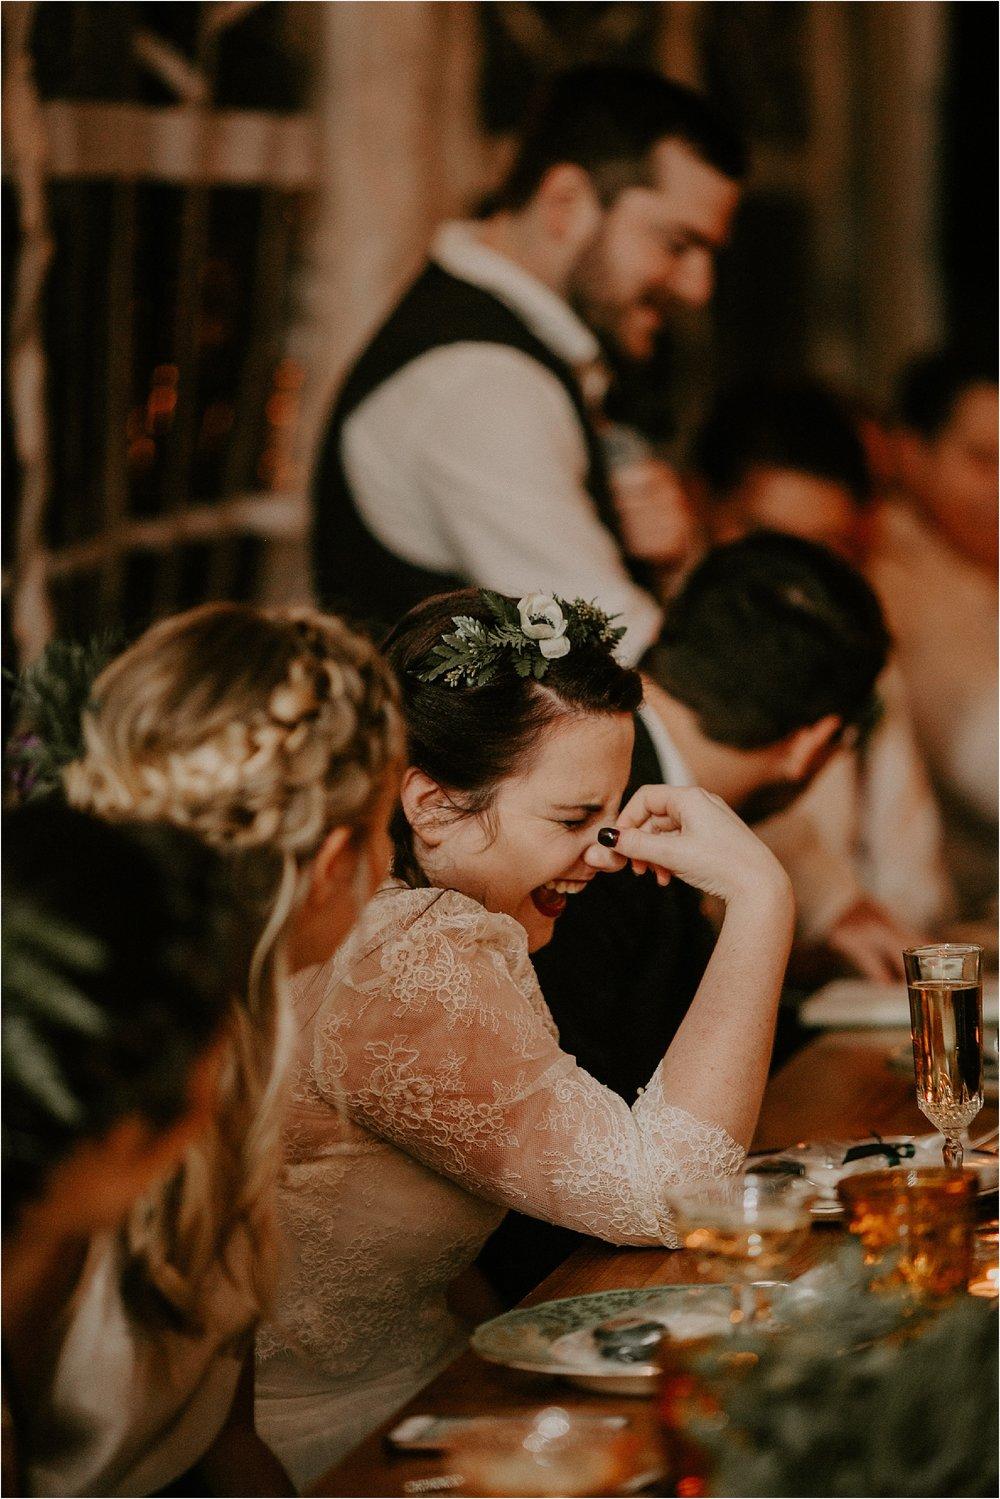 Sarah_Brookhart_Baltimore_Wedding_Photographer_0063.jpg